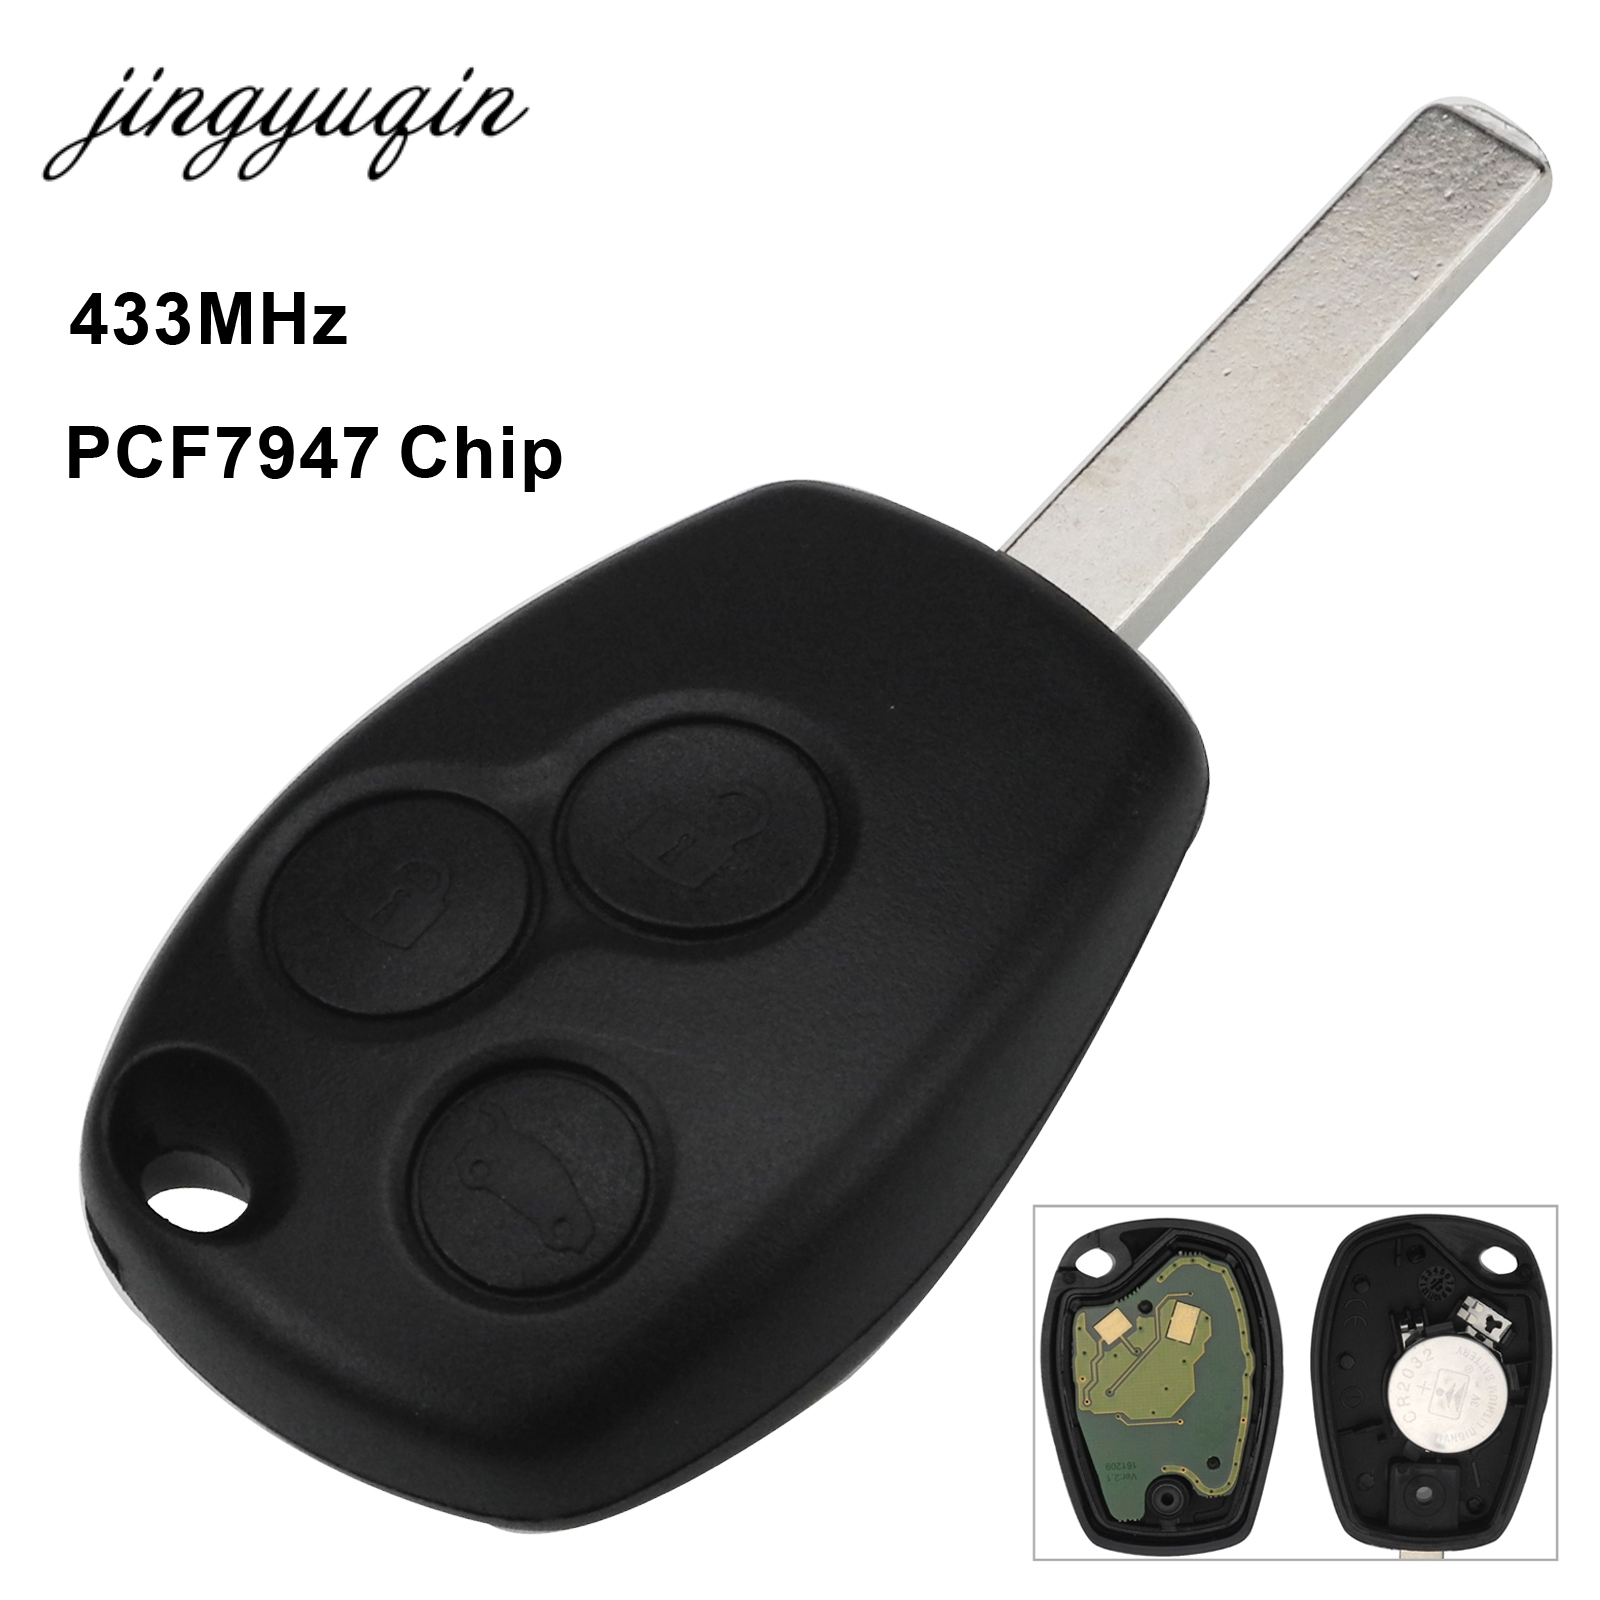 Jingyuqin Fernbedienung Auto Schlüssel 2/3 Taste 433MHz PCF7947 Chip Für Renault/Kangoo II/Clio III Duster modus Twingo DACIA Logan